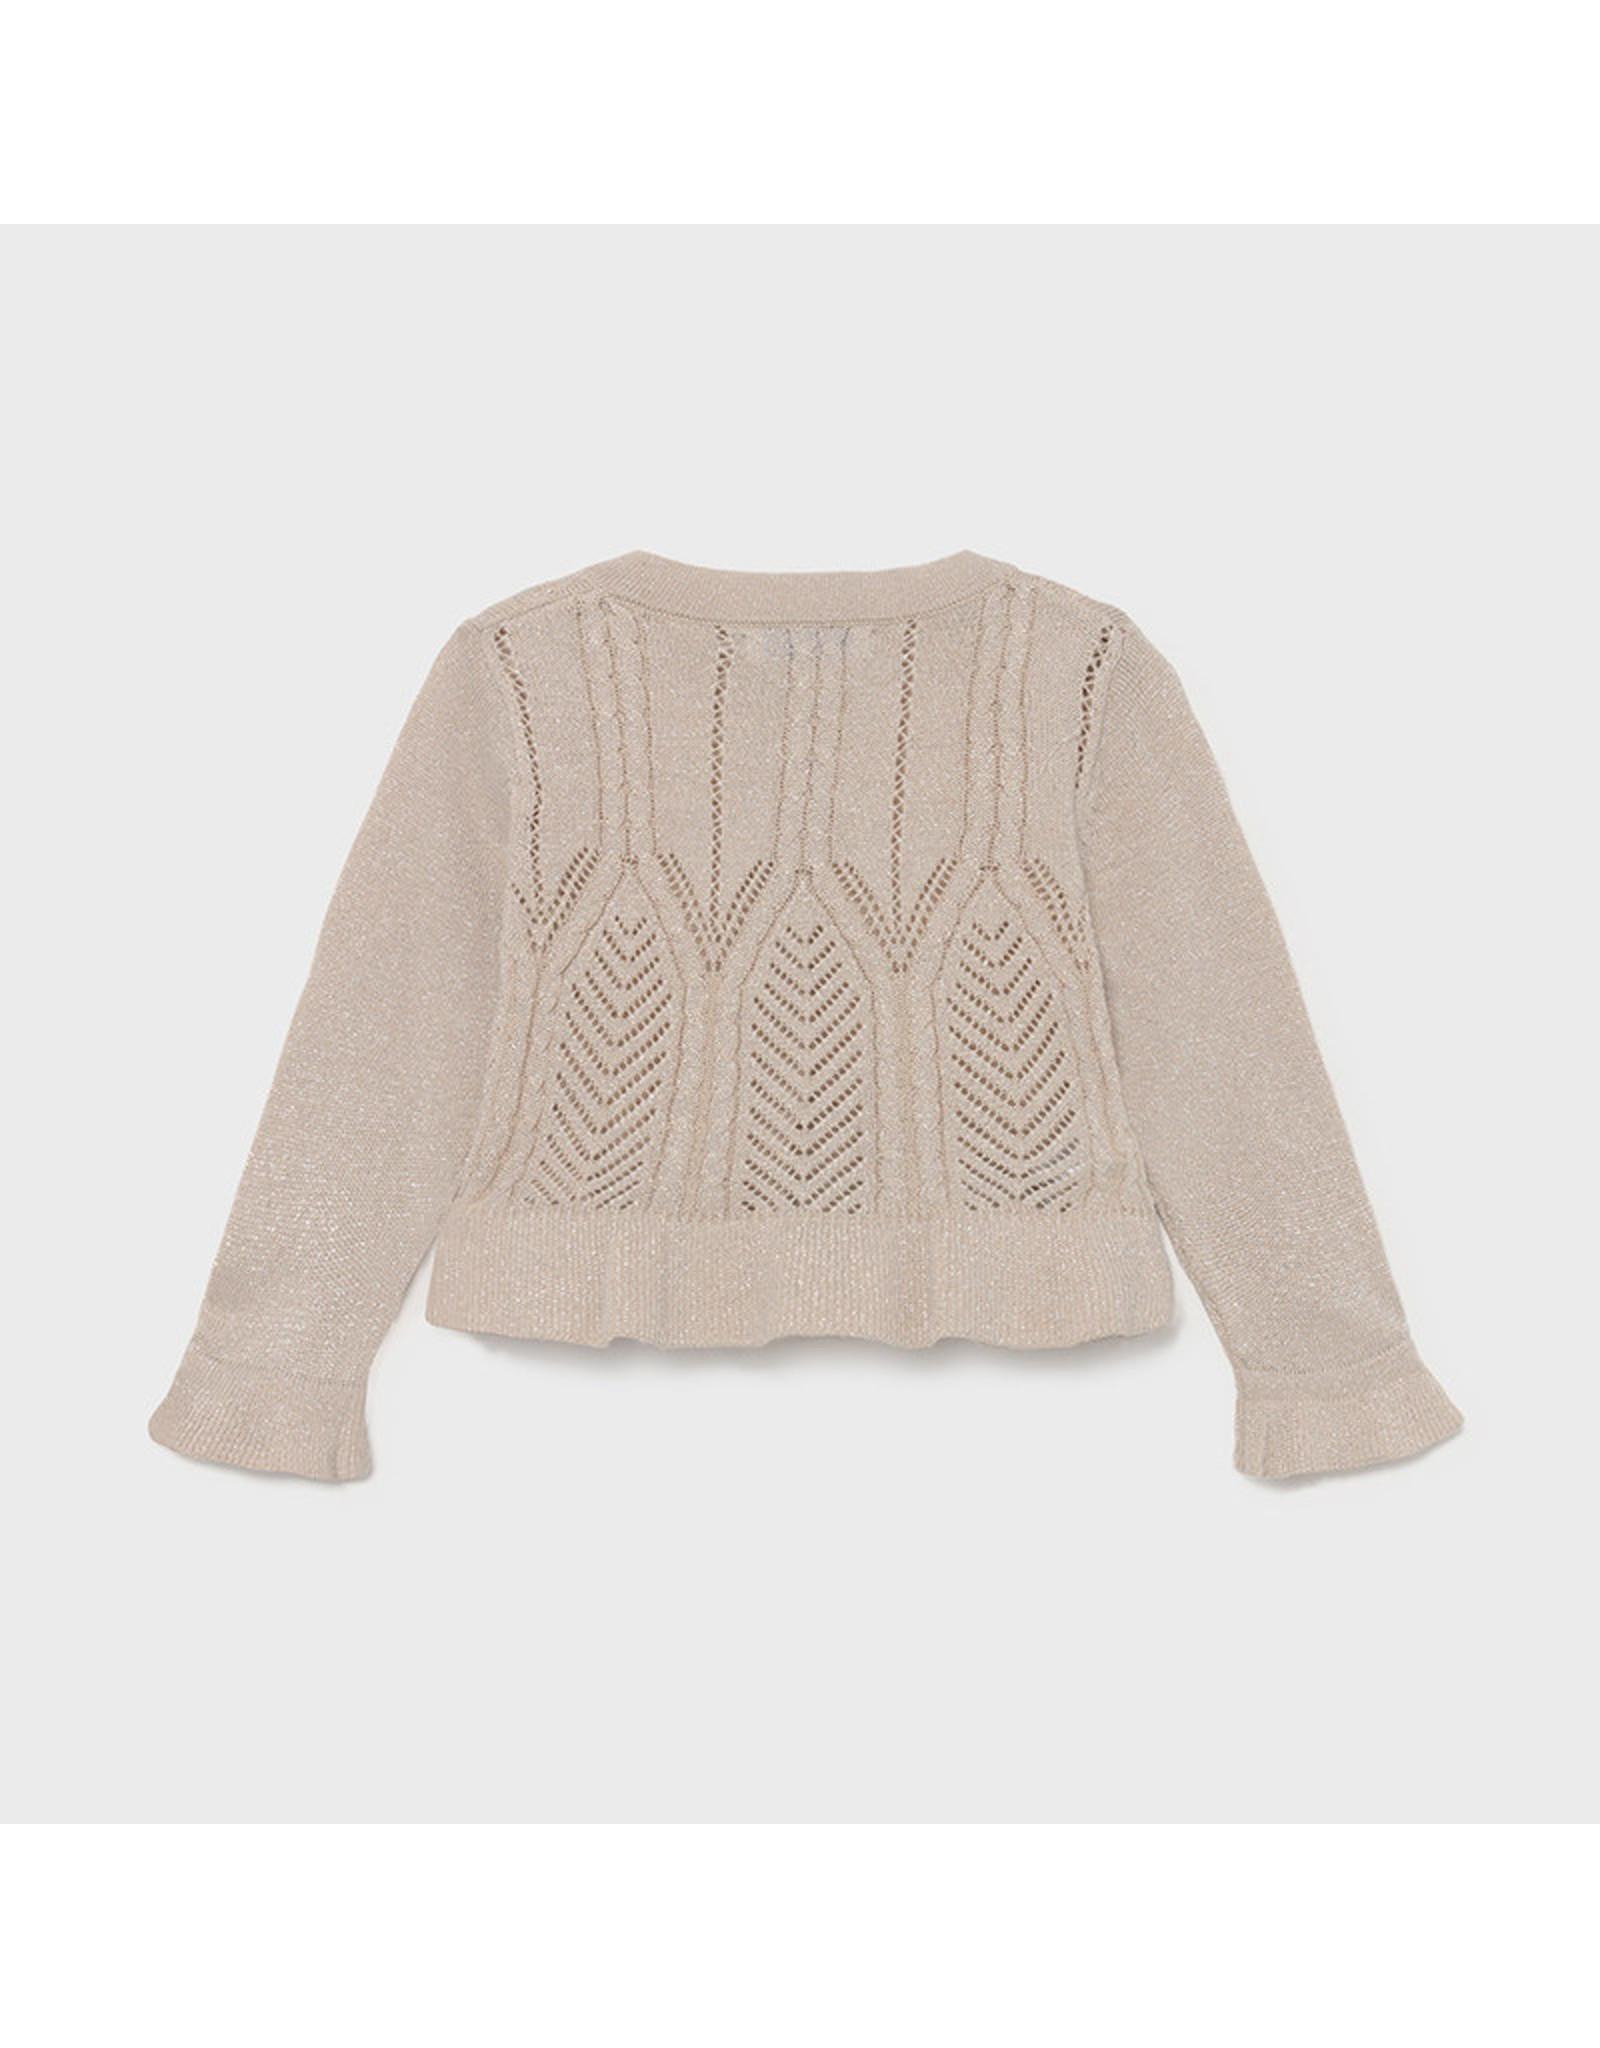 Mayoral Knitting cardigan  Beige Lure